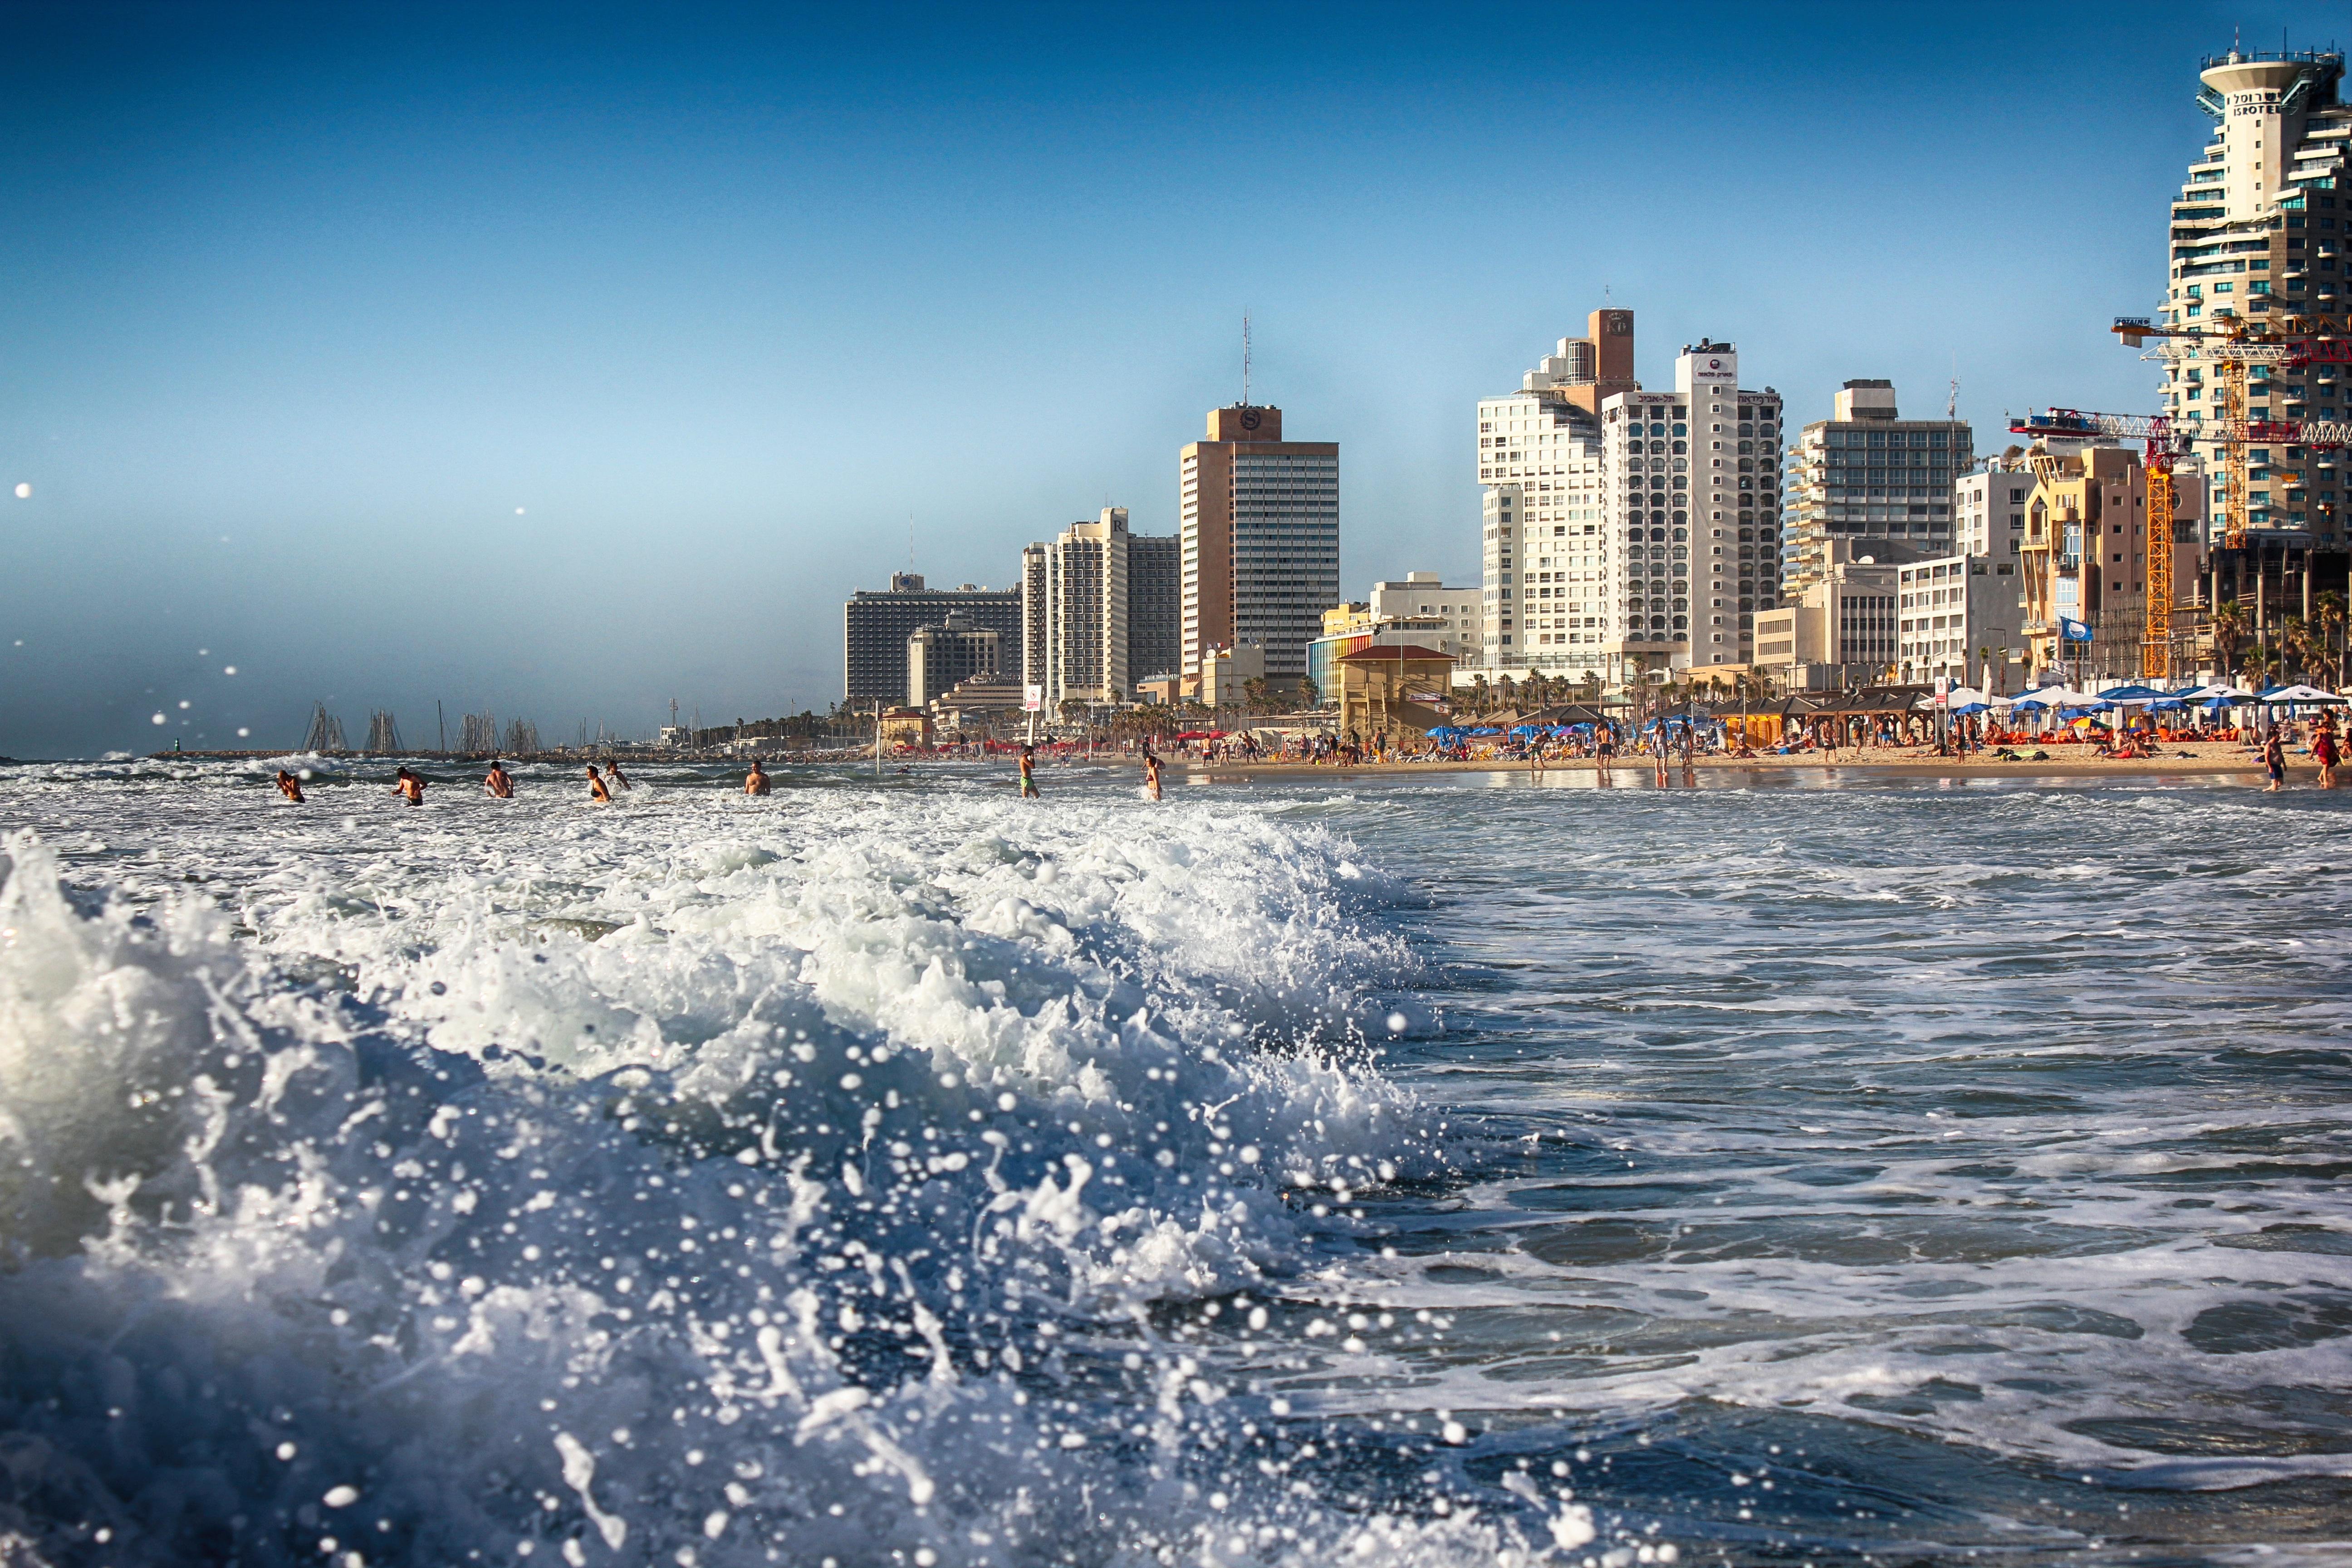 tel aviv expat city u0026 insurance guide expat financial